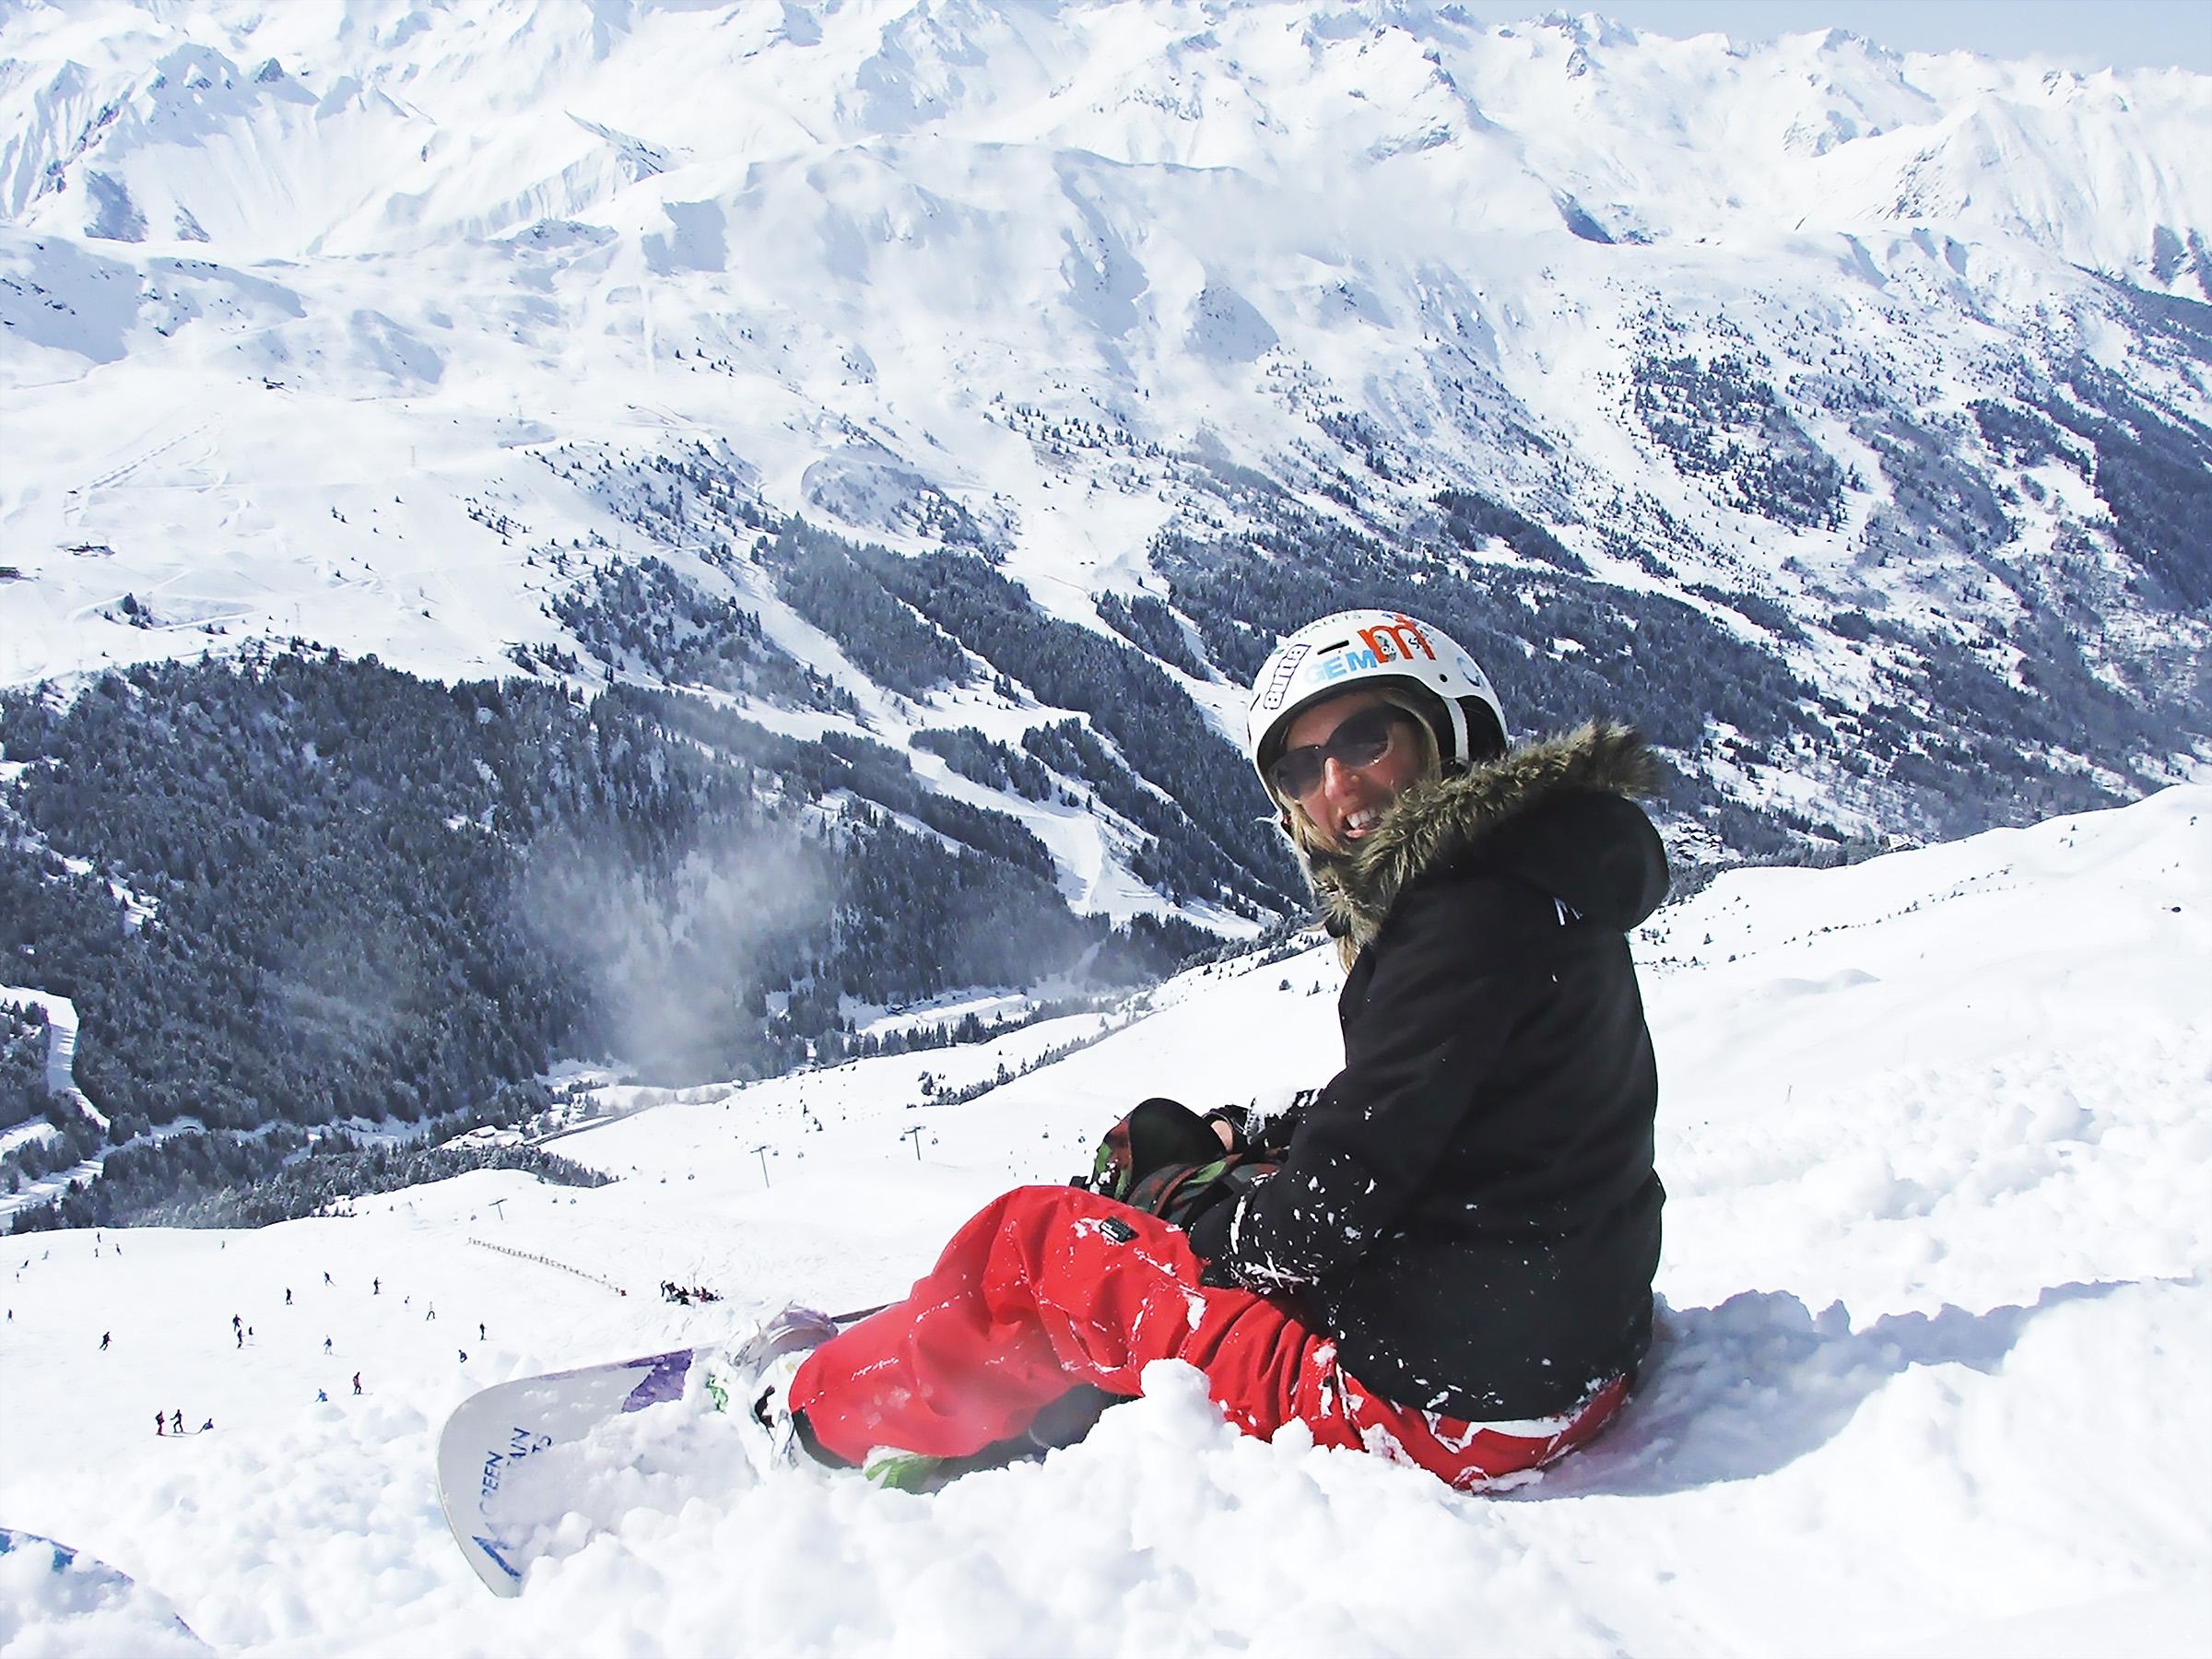 Gemma Hunt snowboarding French Alps